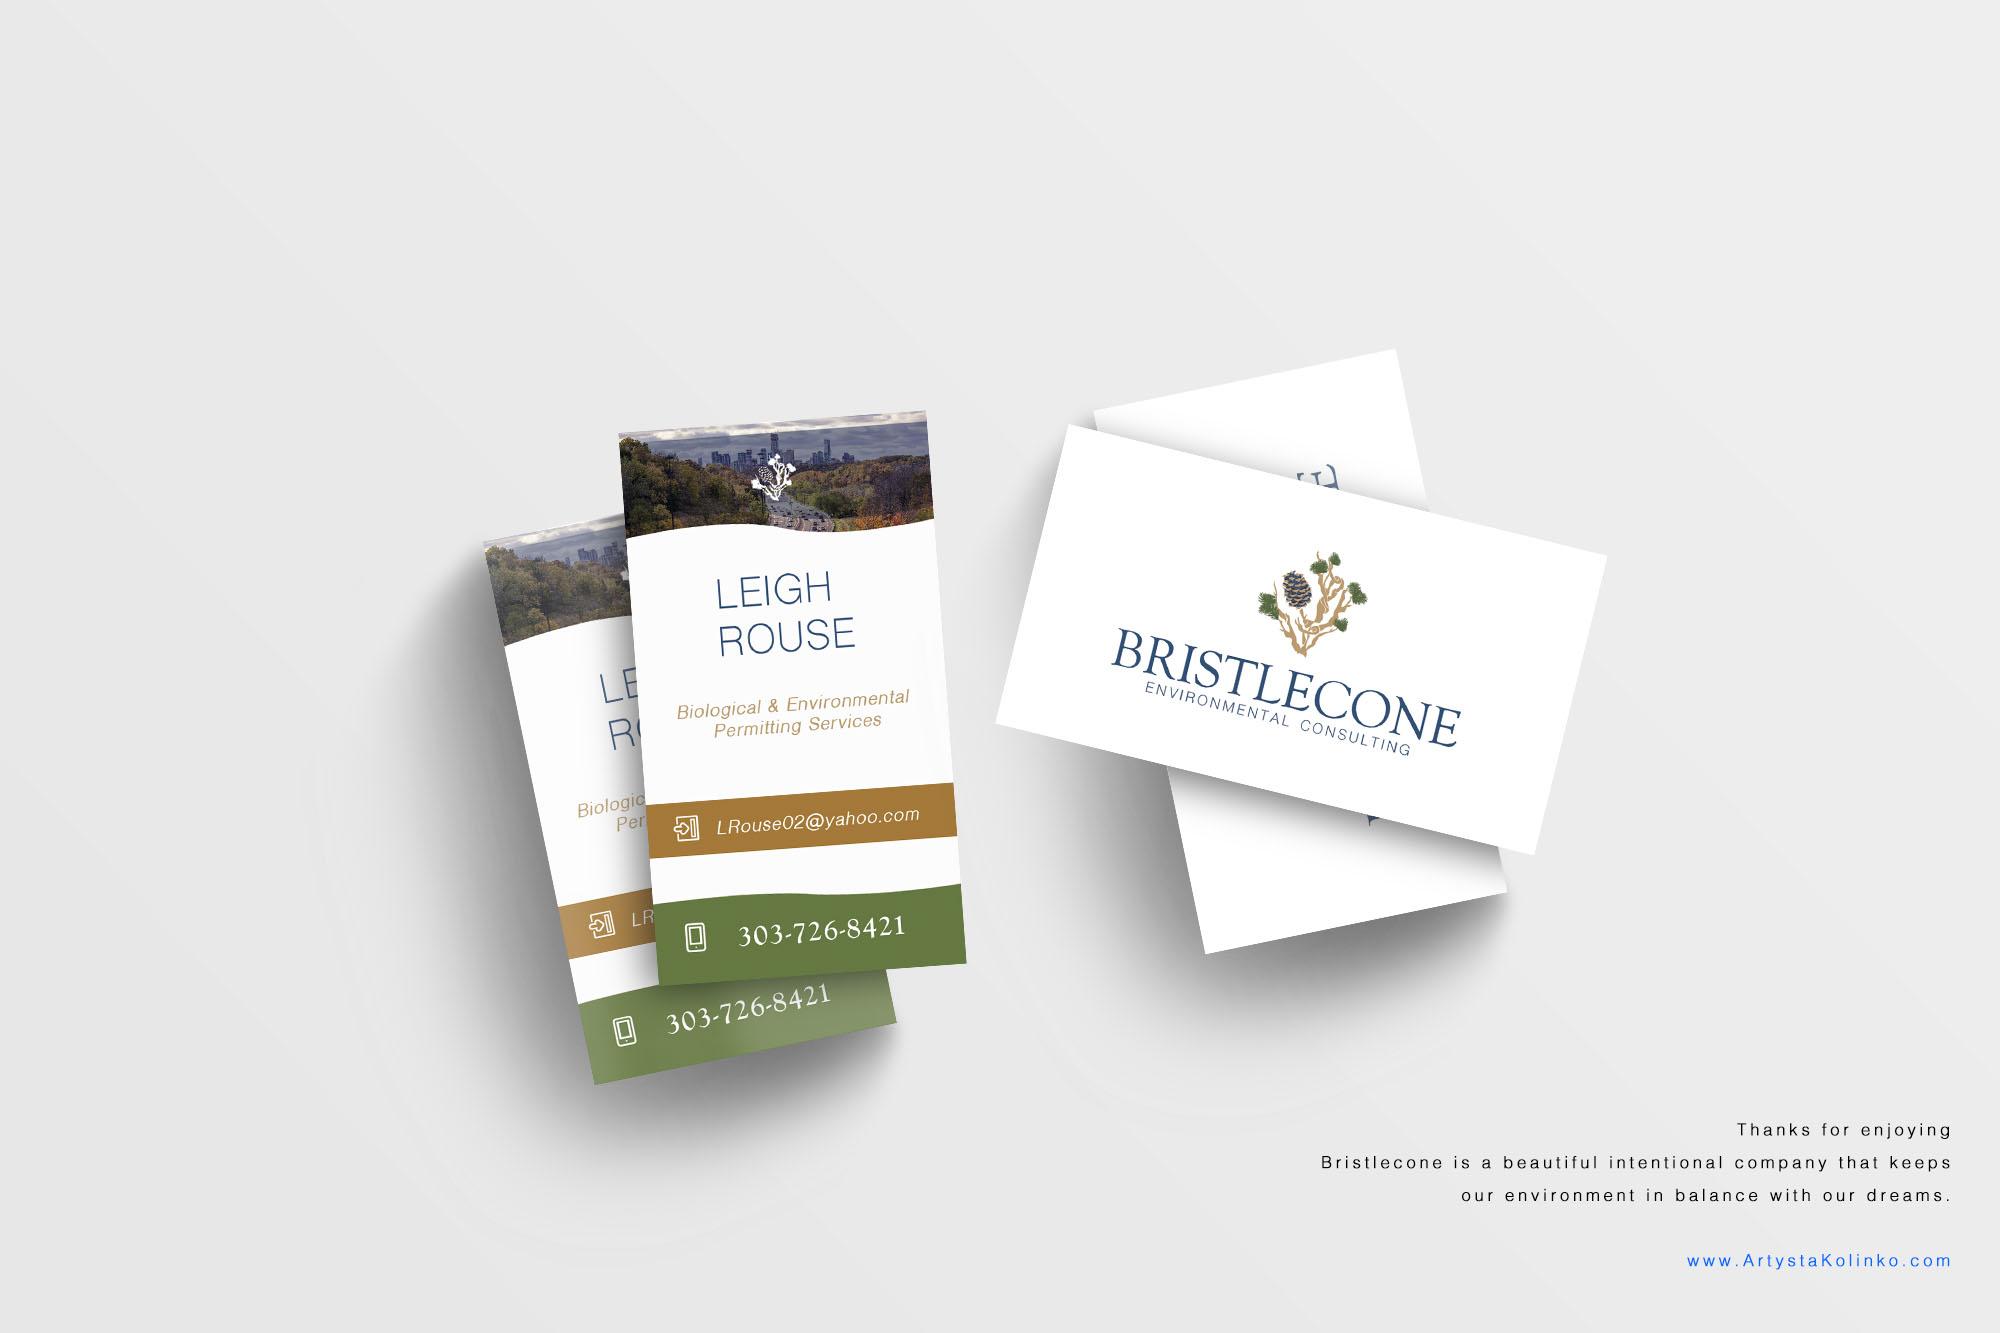 Bristlecone Environmental Consulting